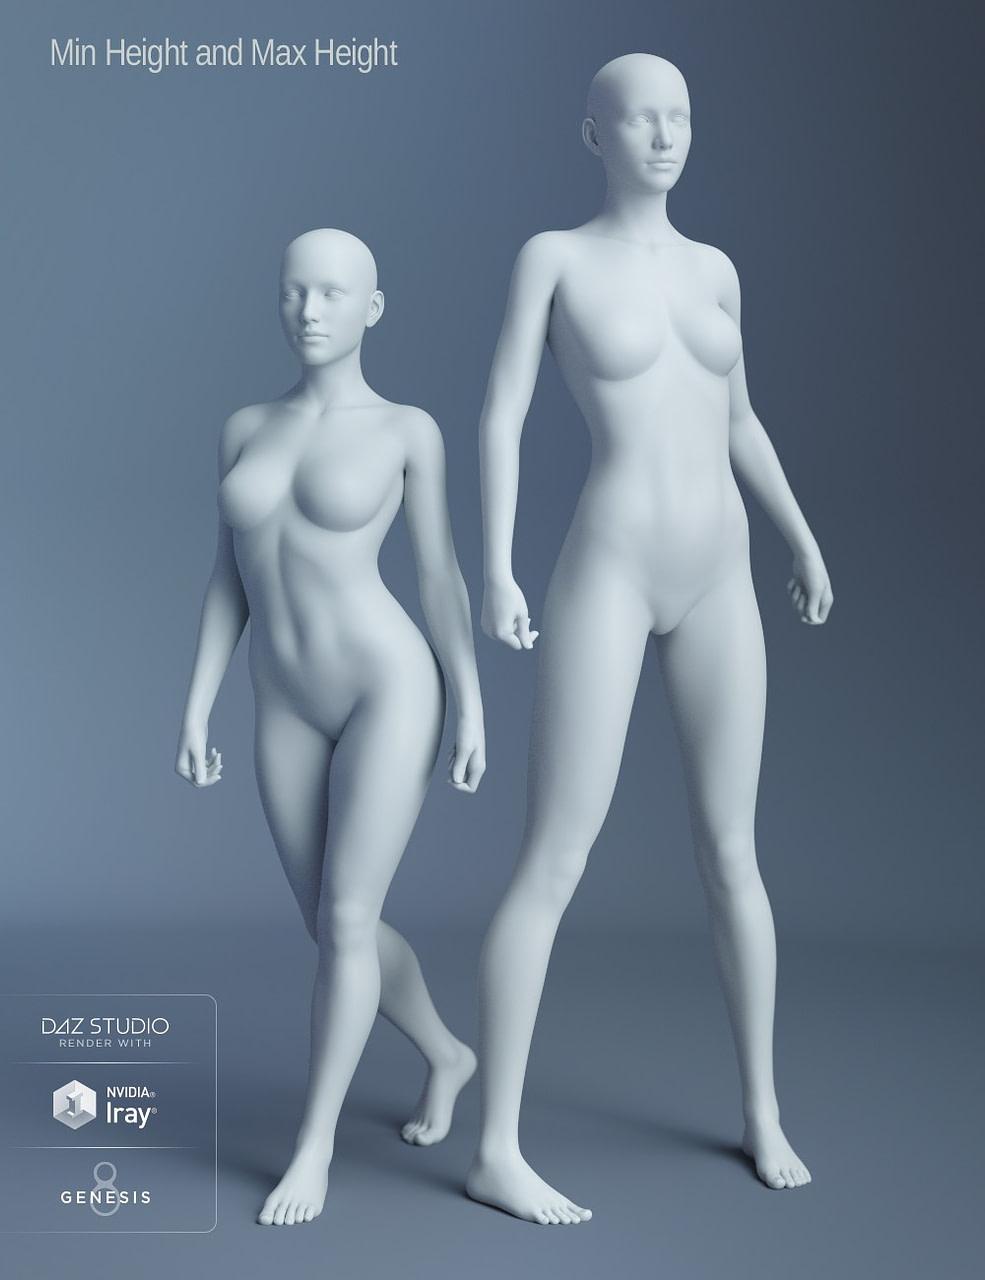 daz body morphs product